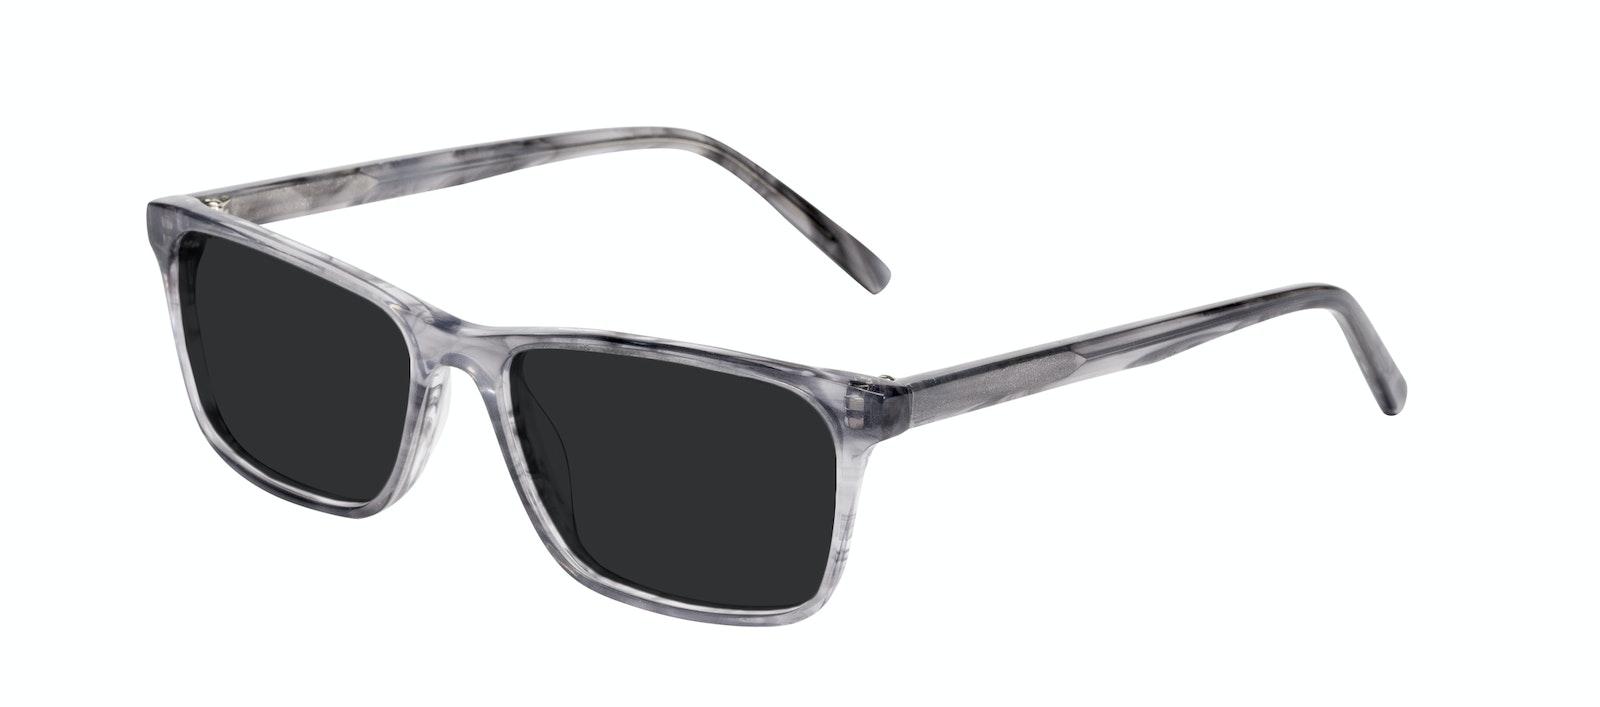 Affordable Fashion Glasses Rectangle Sunglasses Men Henri Smokey Grey Tilt